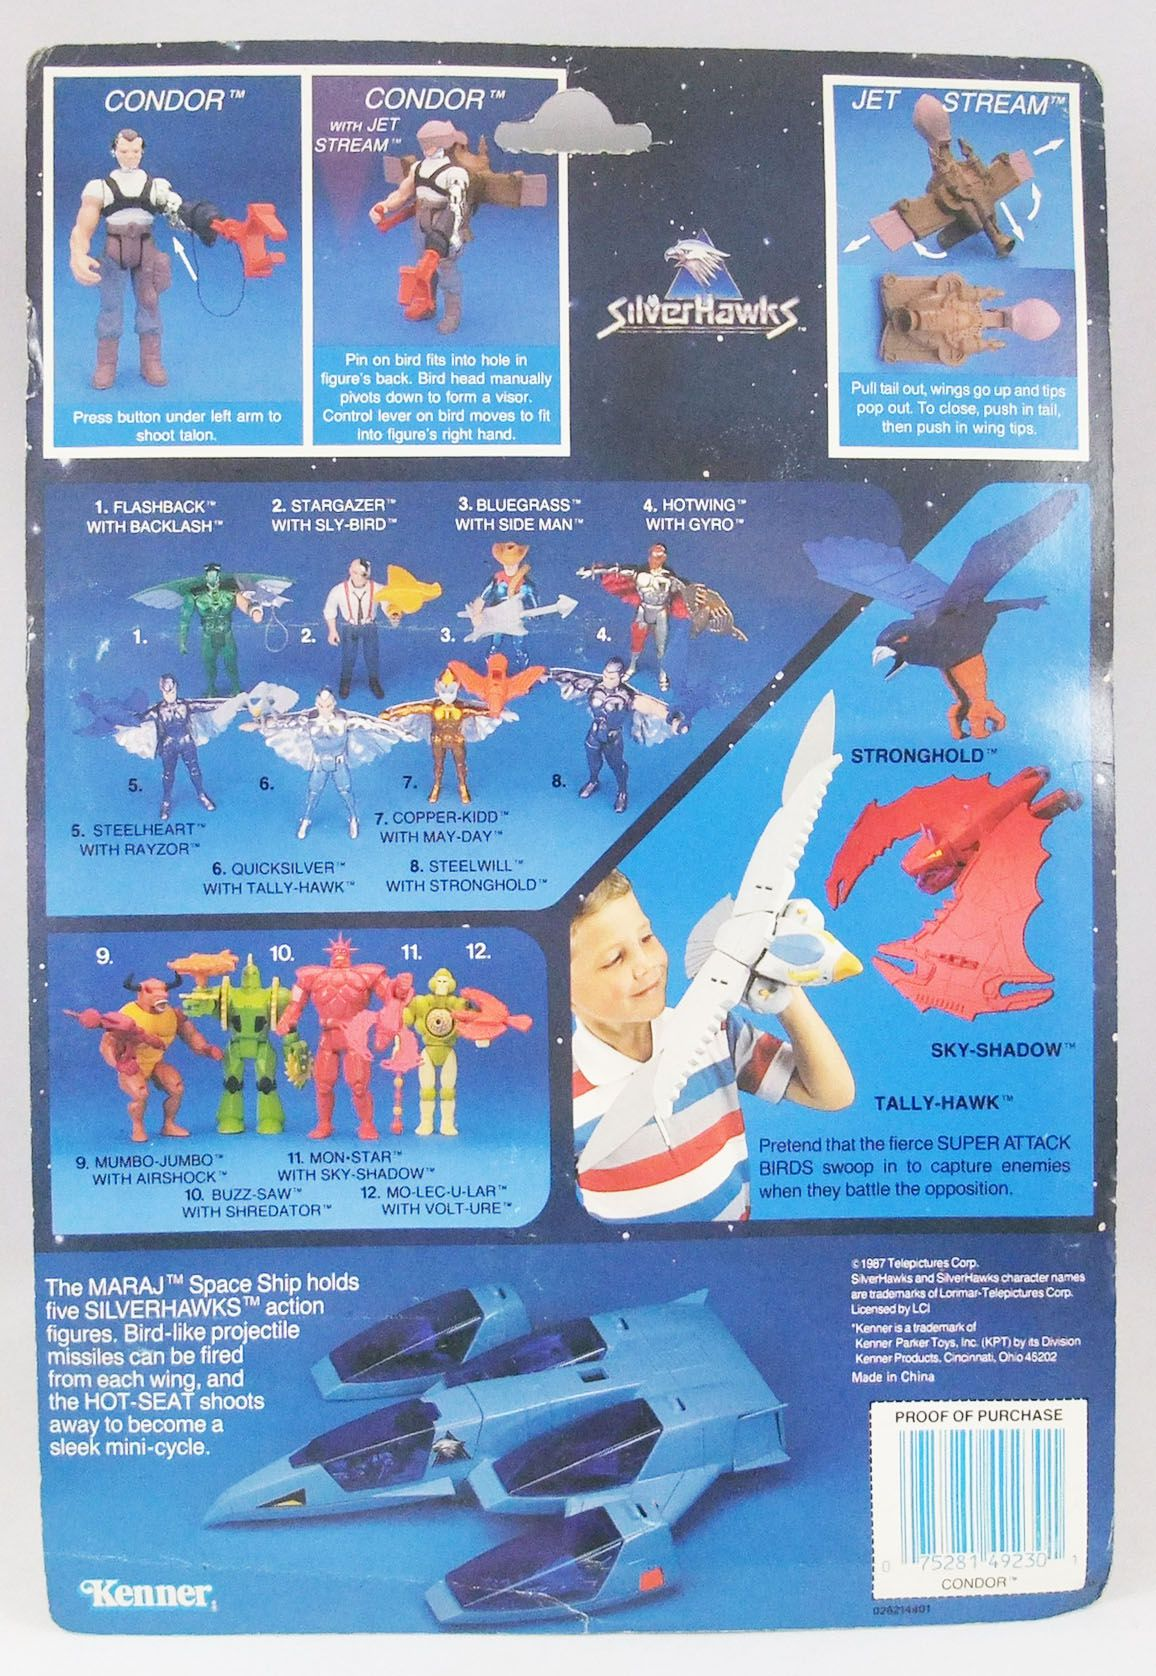 Silverhawks - Kenner - Condor & Jet Stream (carte bleue)